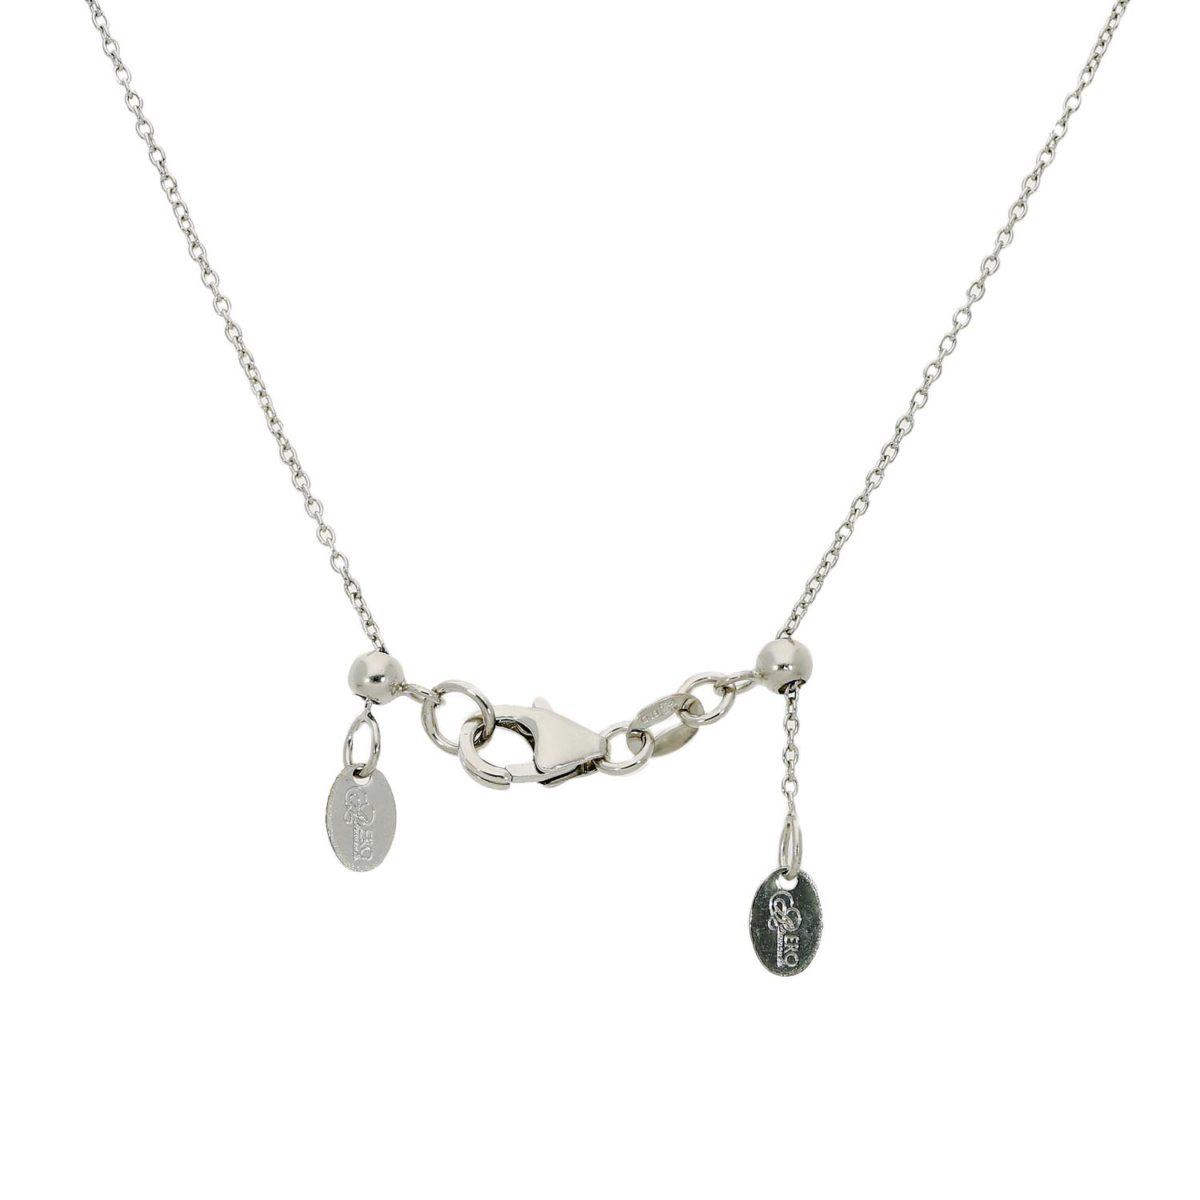 Diamond NecklaceStyle #: RIU-38061